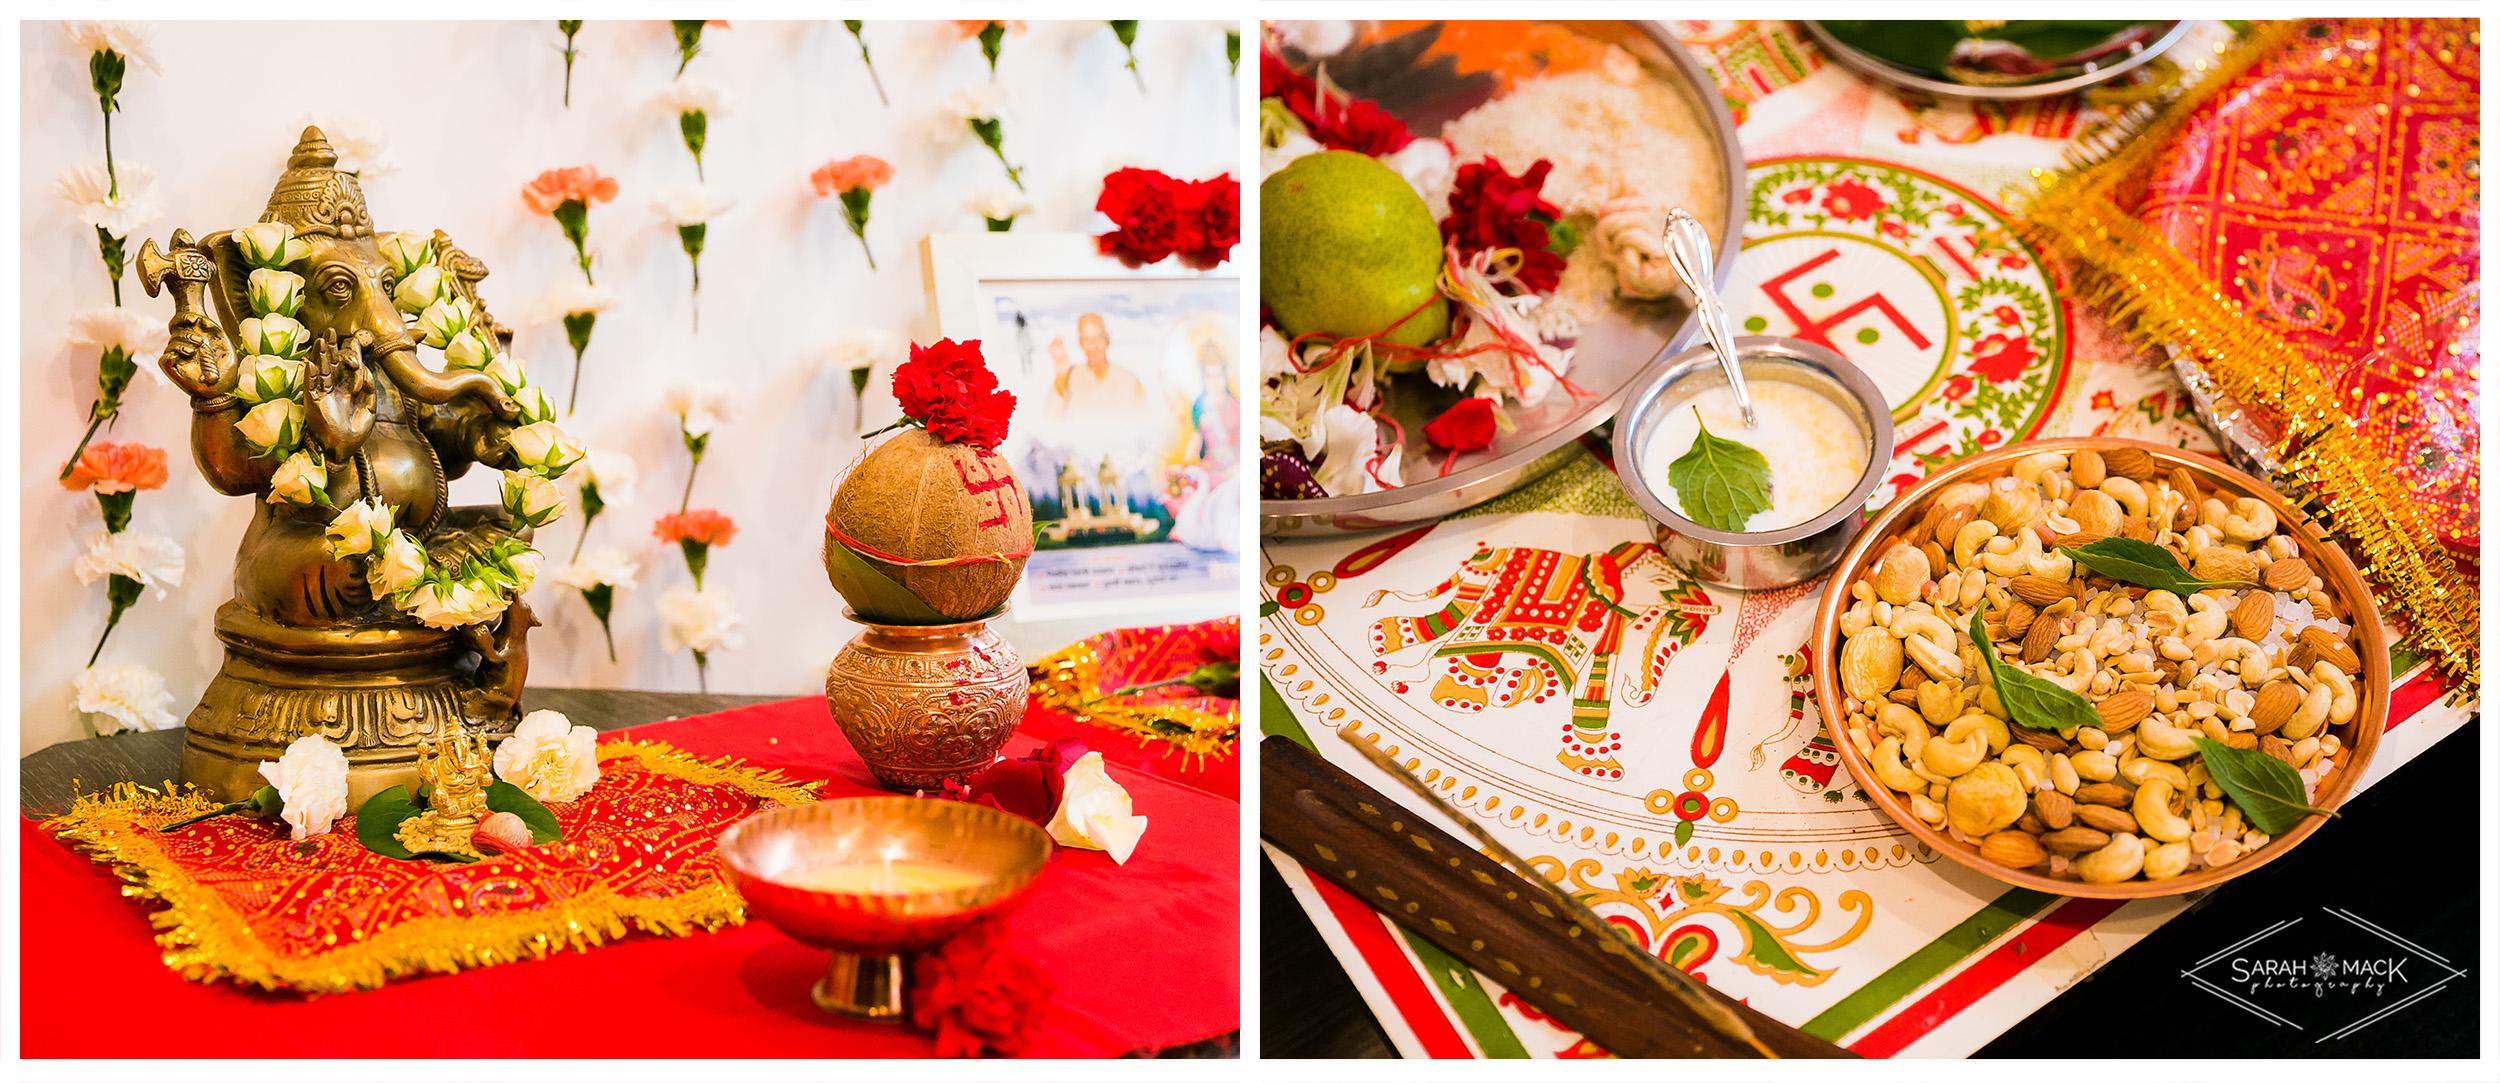 PR-Irvine-Ganesh-Pooja-Indian-Wedding-Photography-4.jpg